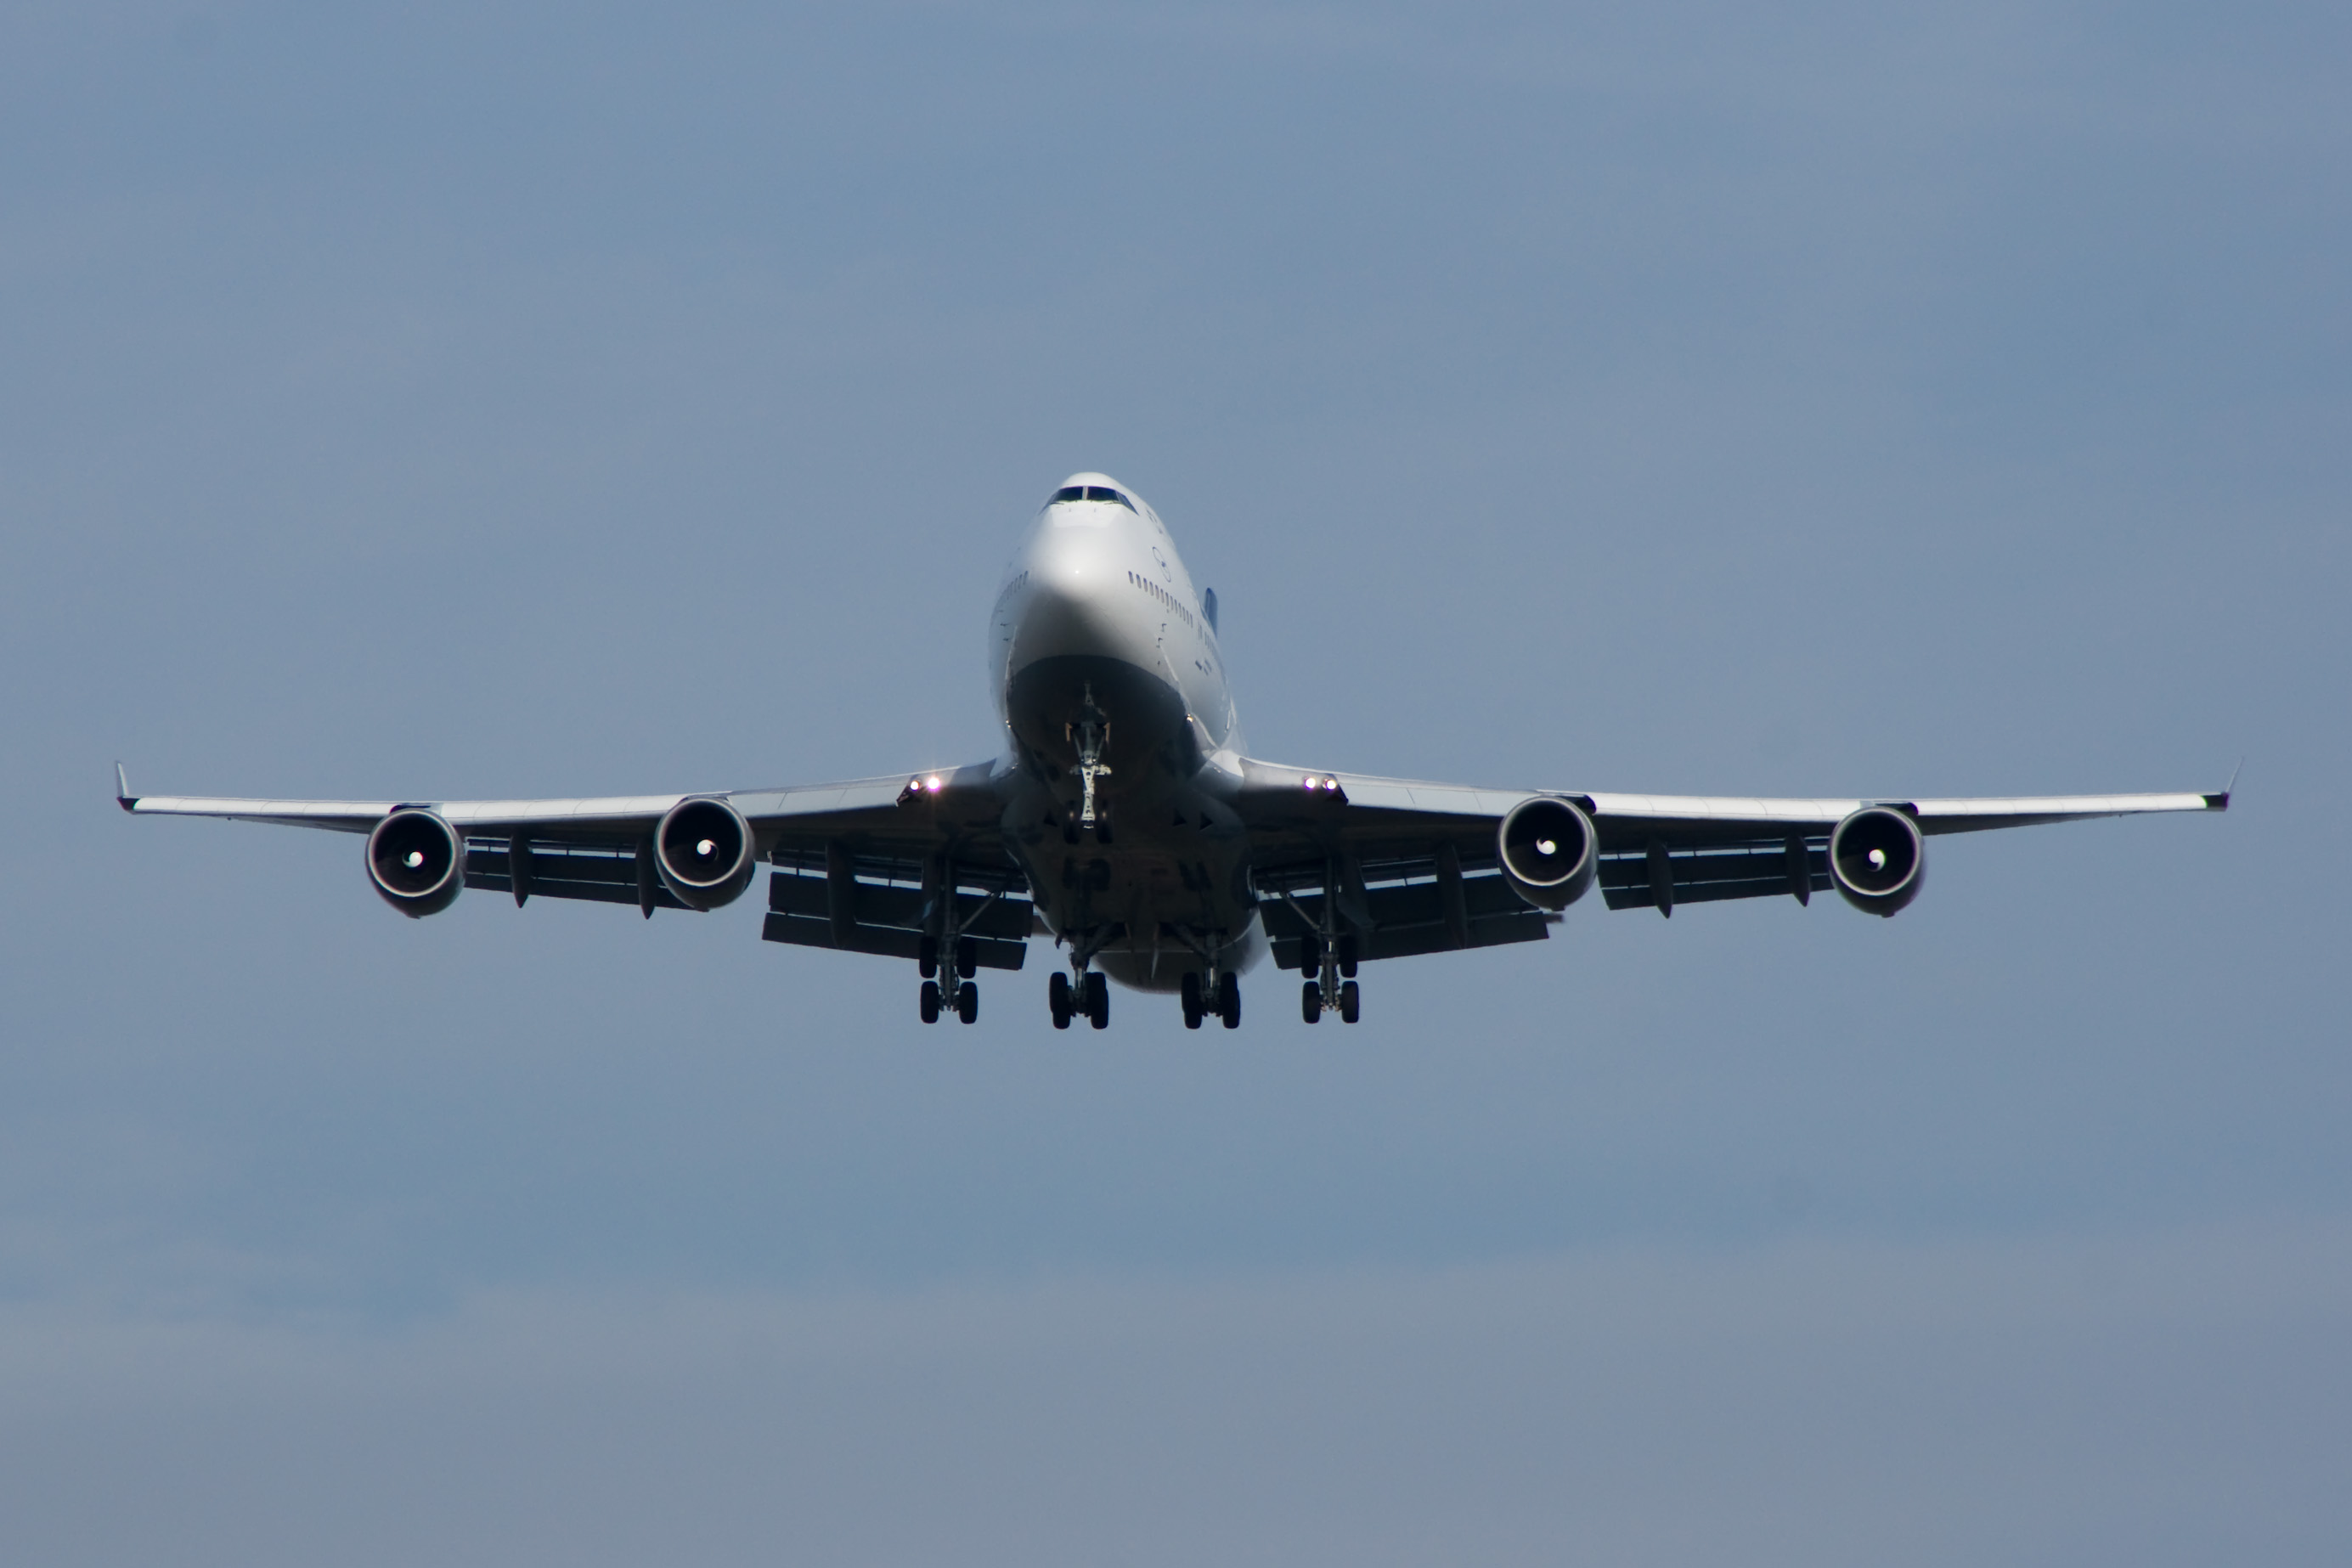 http://upload.wikimedia.org/wikipedia/commons/1/16/Boeing_747_Lufthansa.jpg